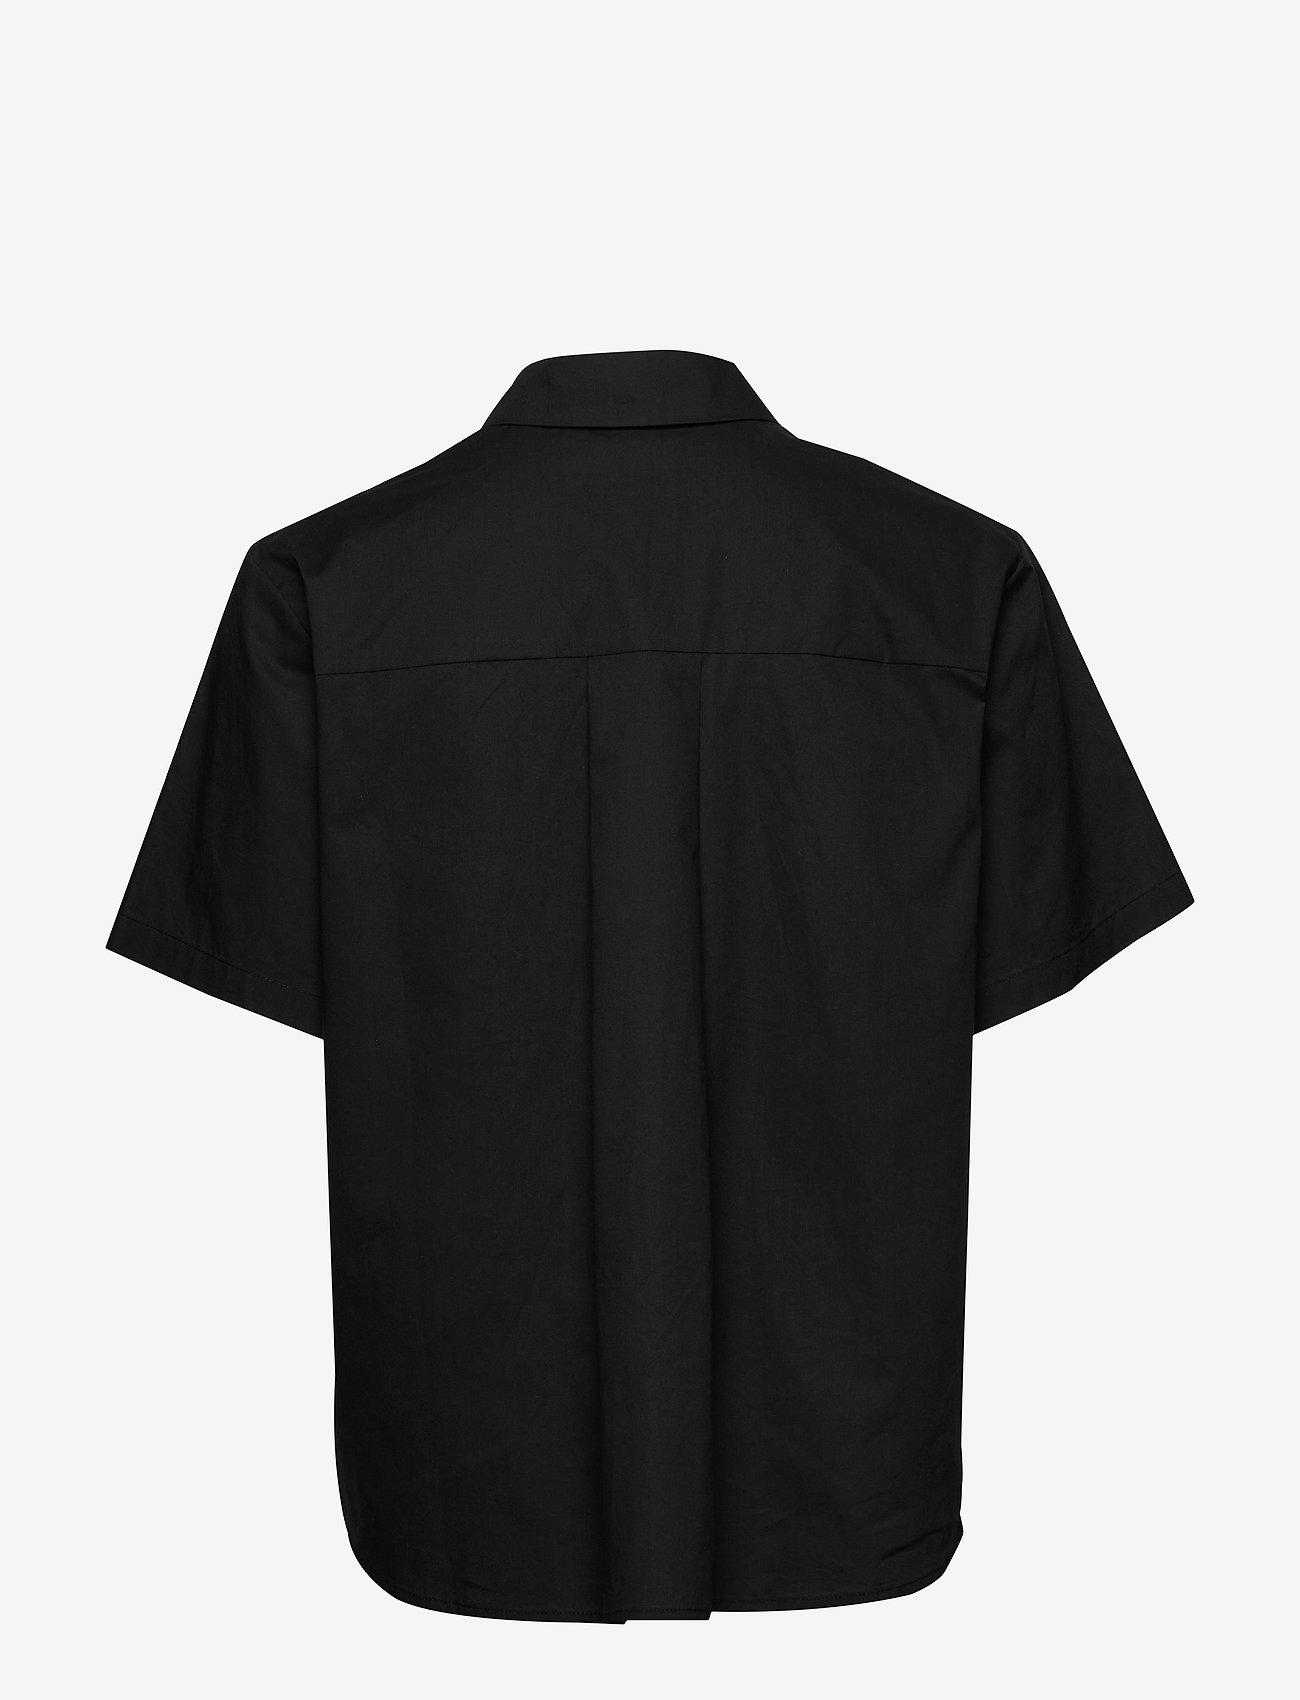 Samsøe Samsøe - Mina shirt ss 10451 - overhemden met korte mouwen - black - 1